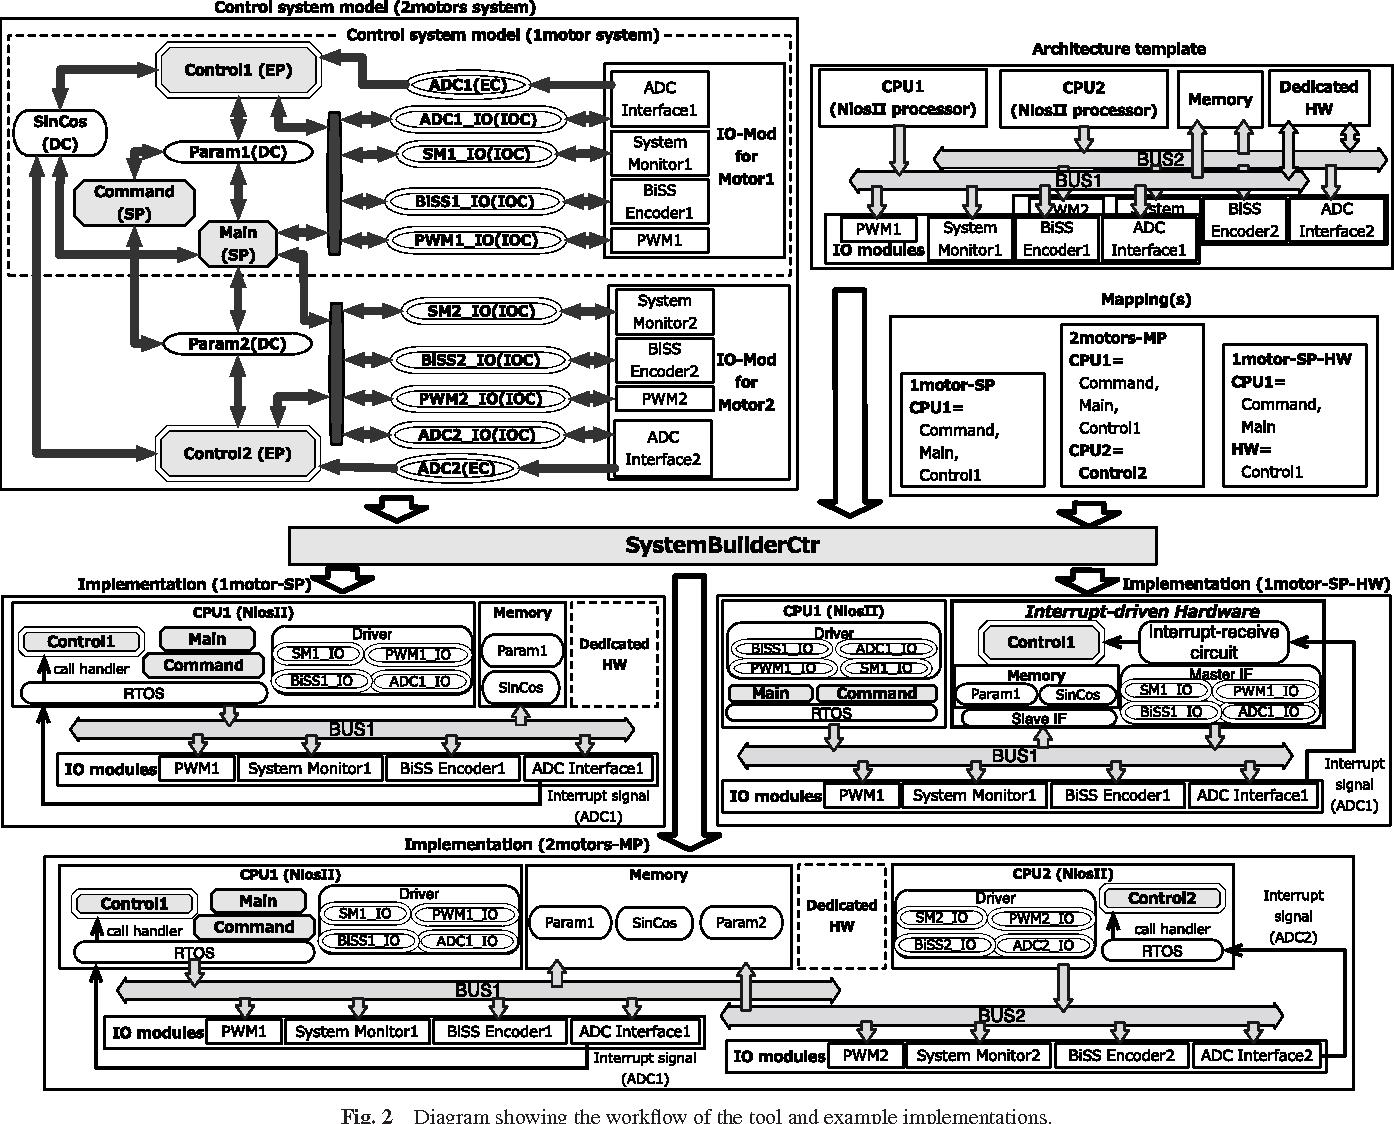 Pdf System Level Design Method For Control Systems With Hardware Implemented Interrupt Handler Semantic Scholar